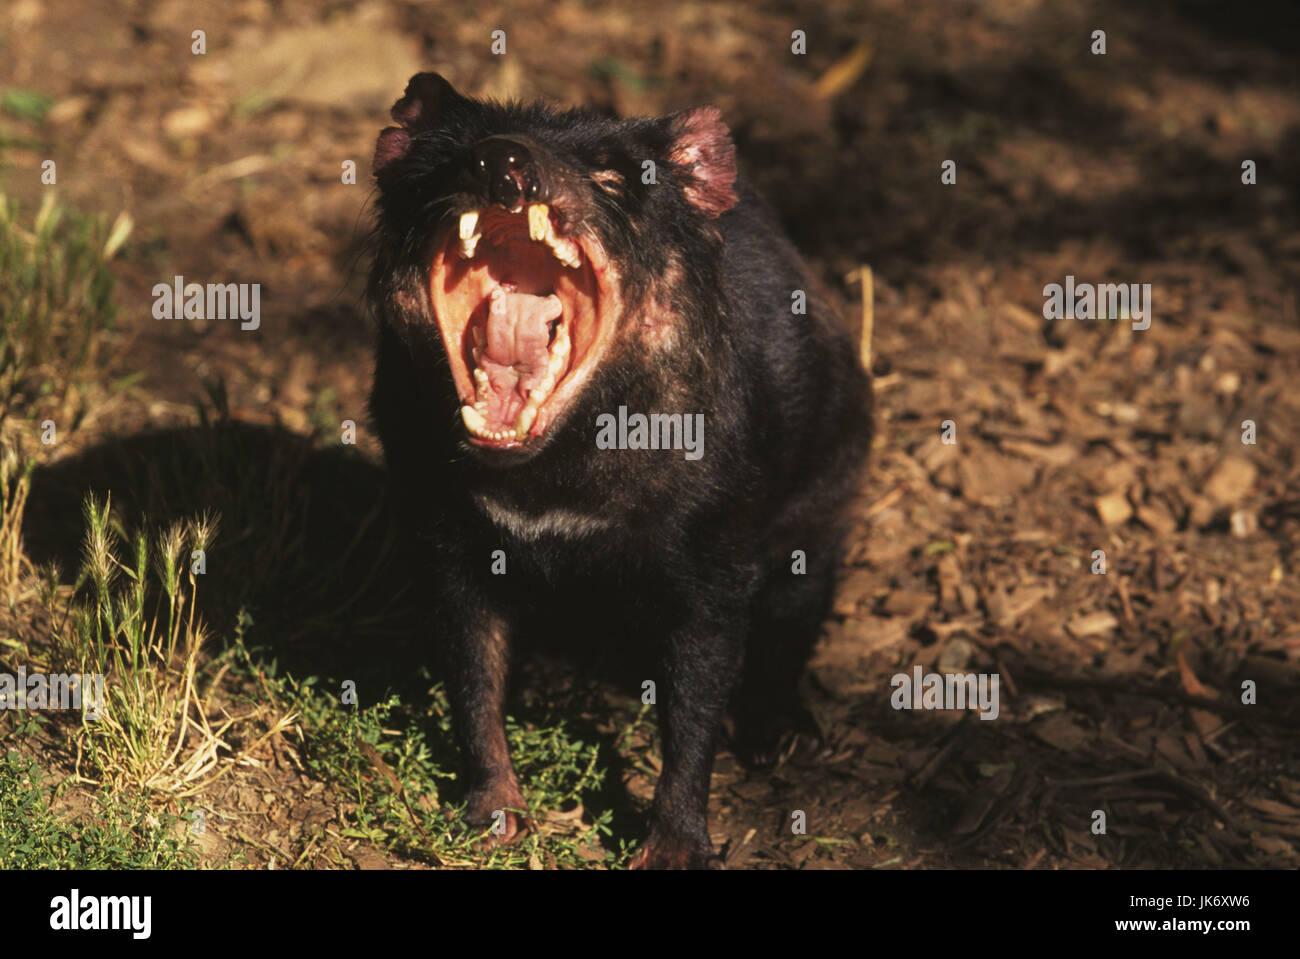 Australien, Tasmanien, Beutelteufel, Sacrophilus harrisi, gähnen  Tasmania, Insel Tasmanien, Natur, Tierwelt, - Stock Image